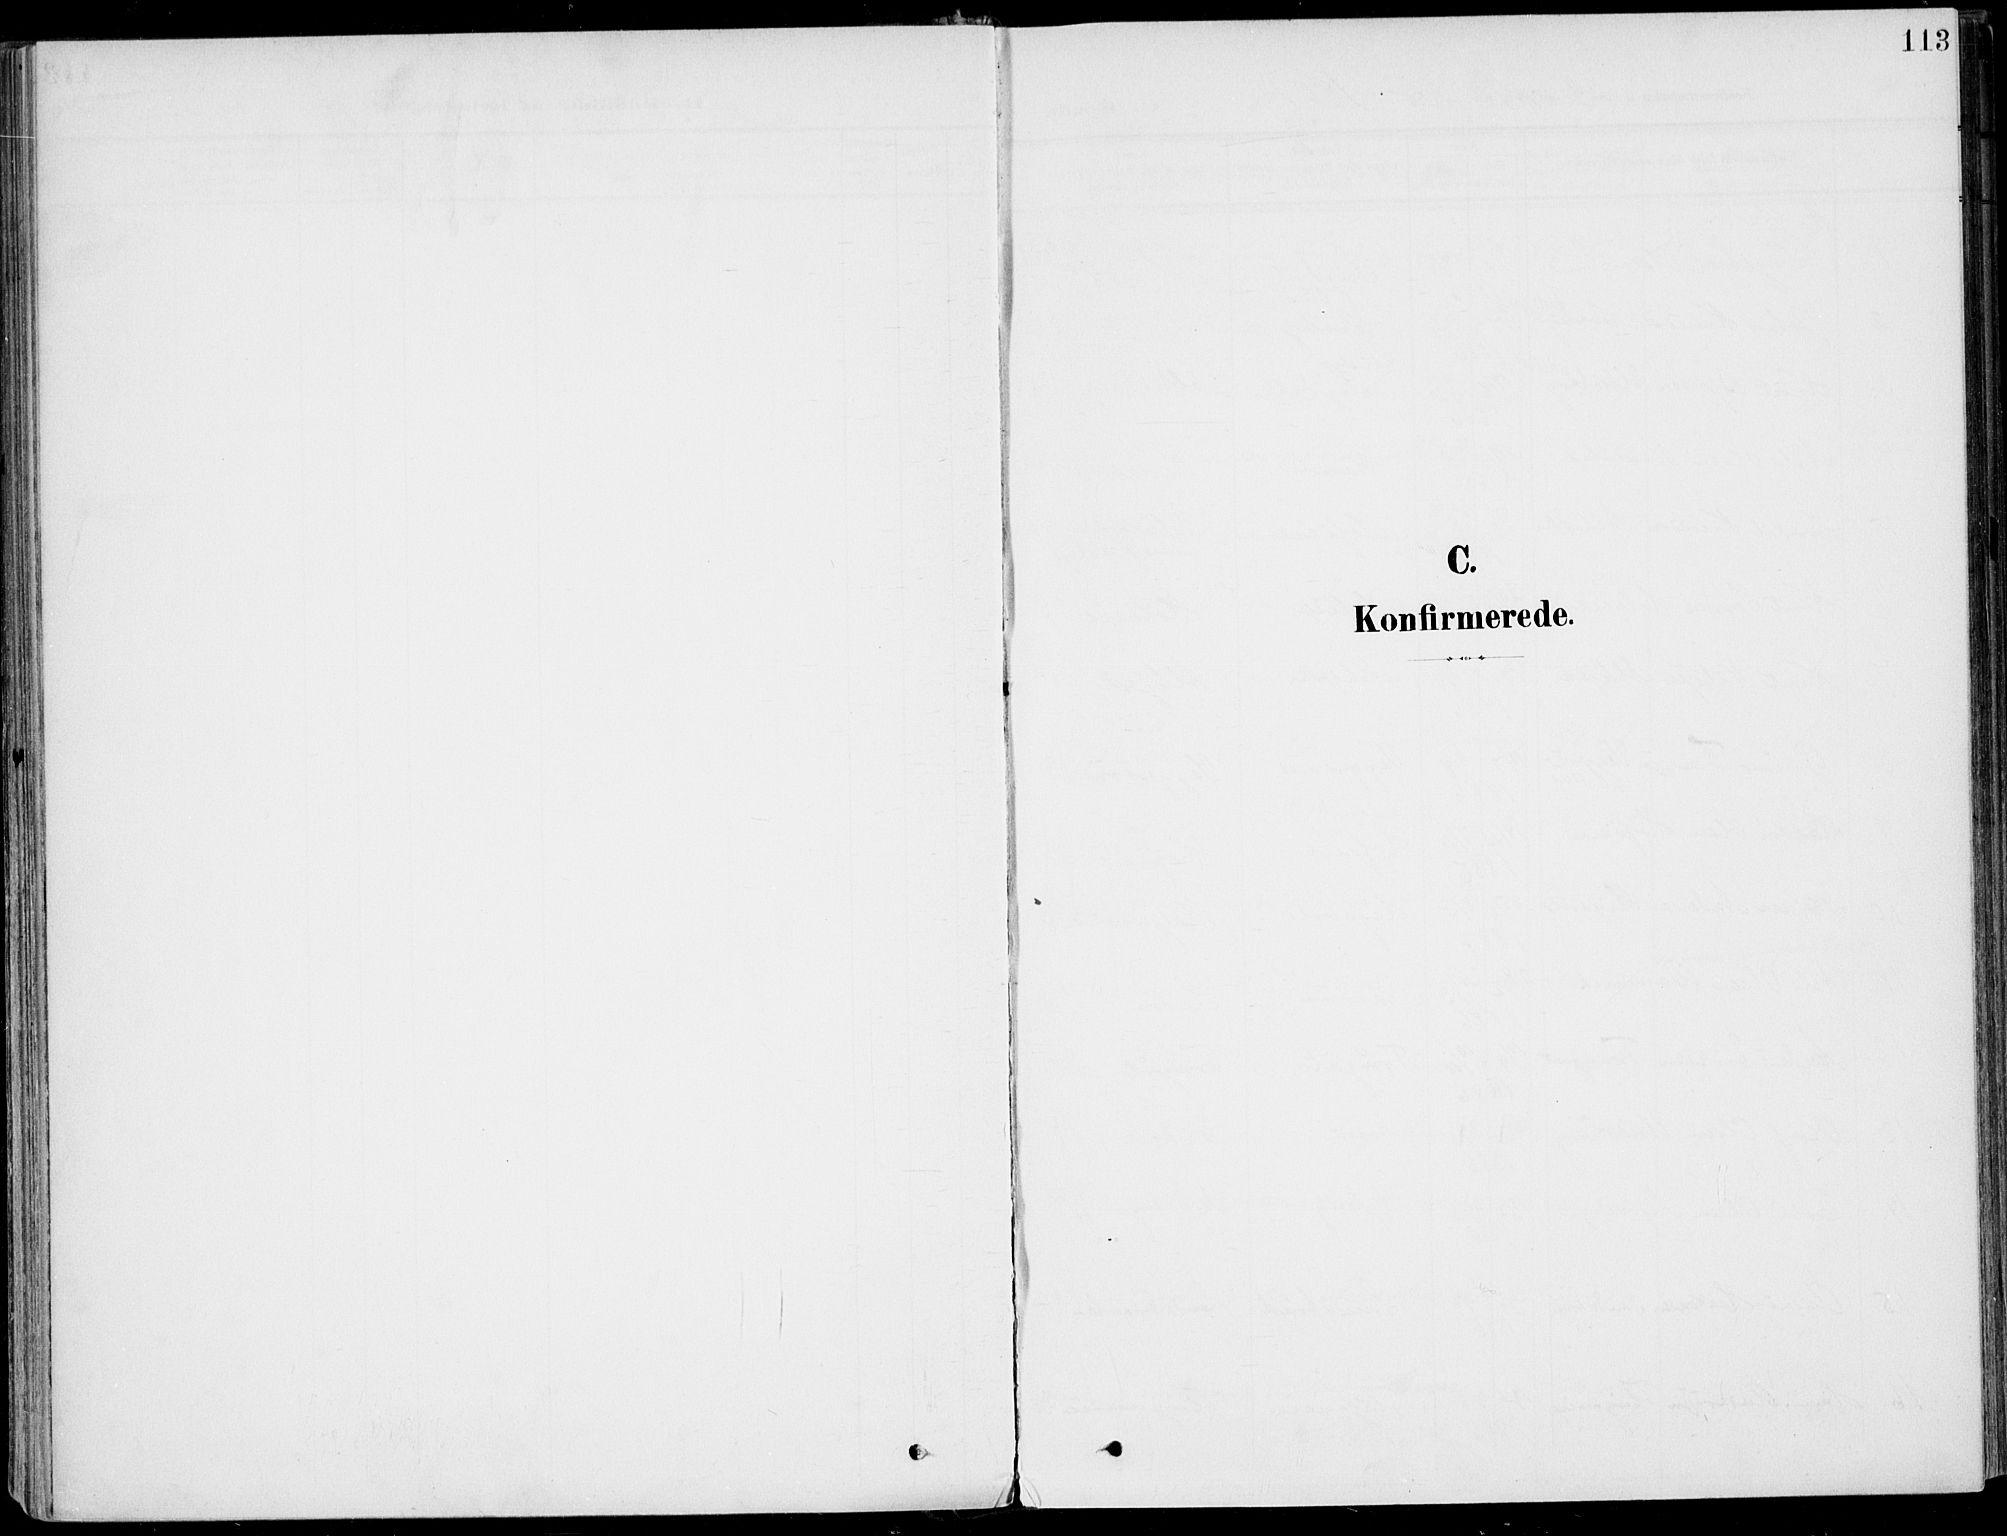 SAKO, Sigdal kirkebøker, F/Fb/L0002: Ministerialbok nr. II 2, 1901-1914, s. 113